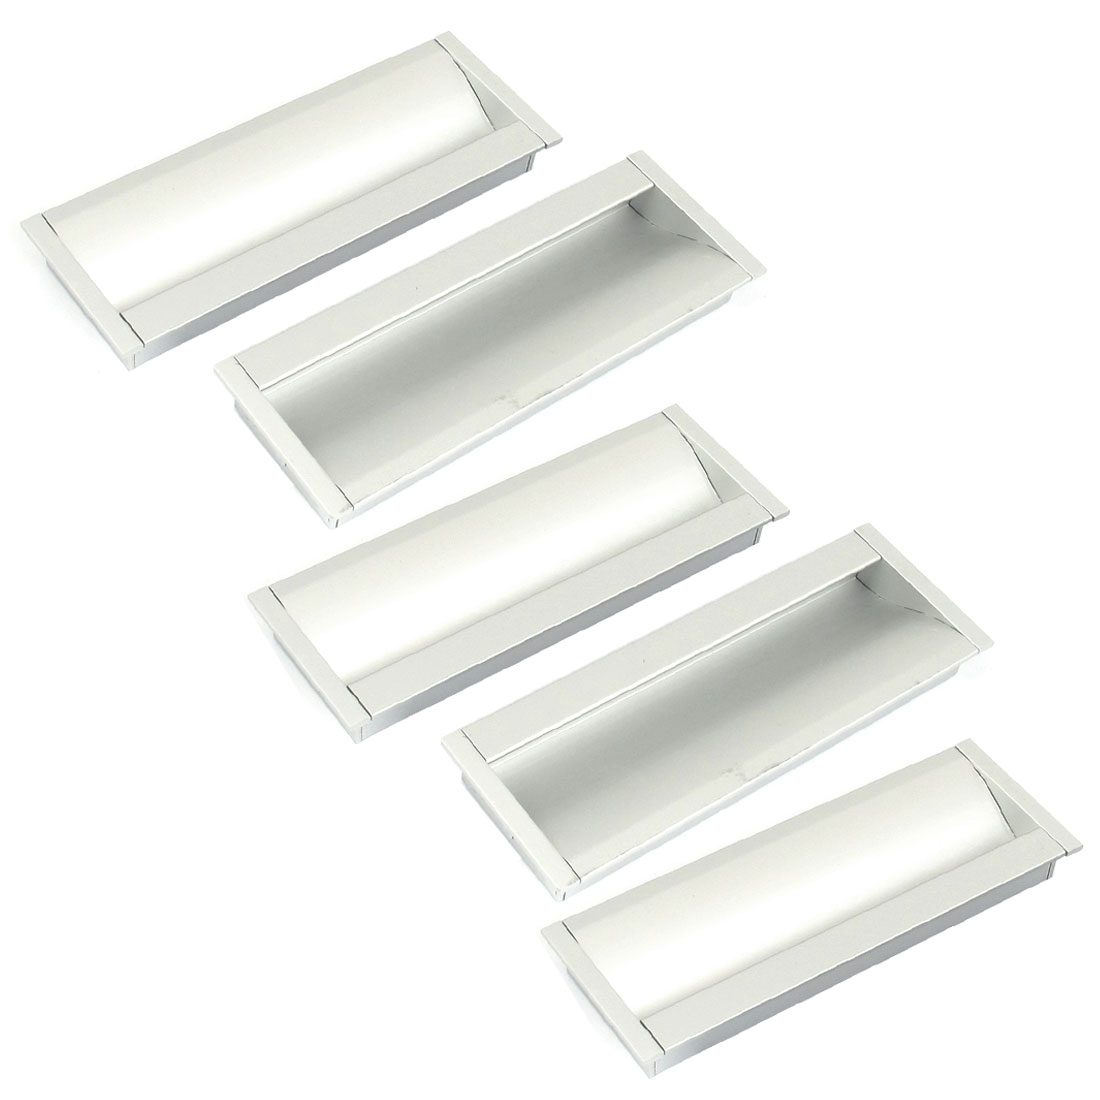 5Pcs Aluminium Alloy Cabinet Drawer Cupboard Door Pull Handle Grip 130mm Length